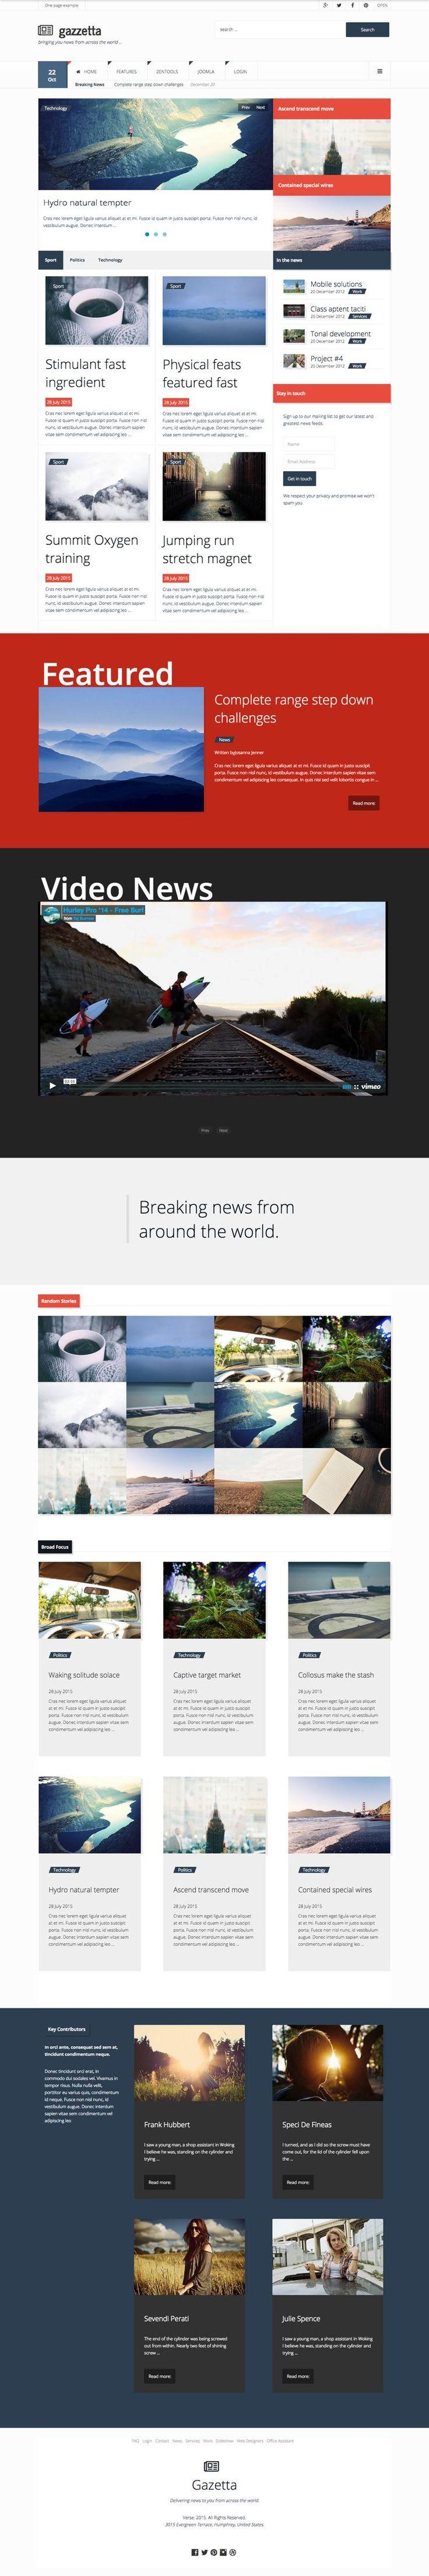 Gazetta Joomla Magazine Template - www.templates4all.com